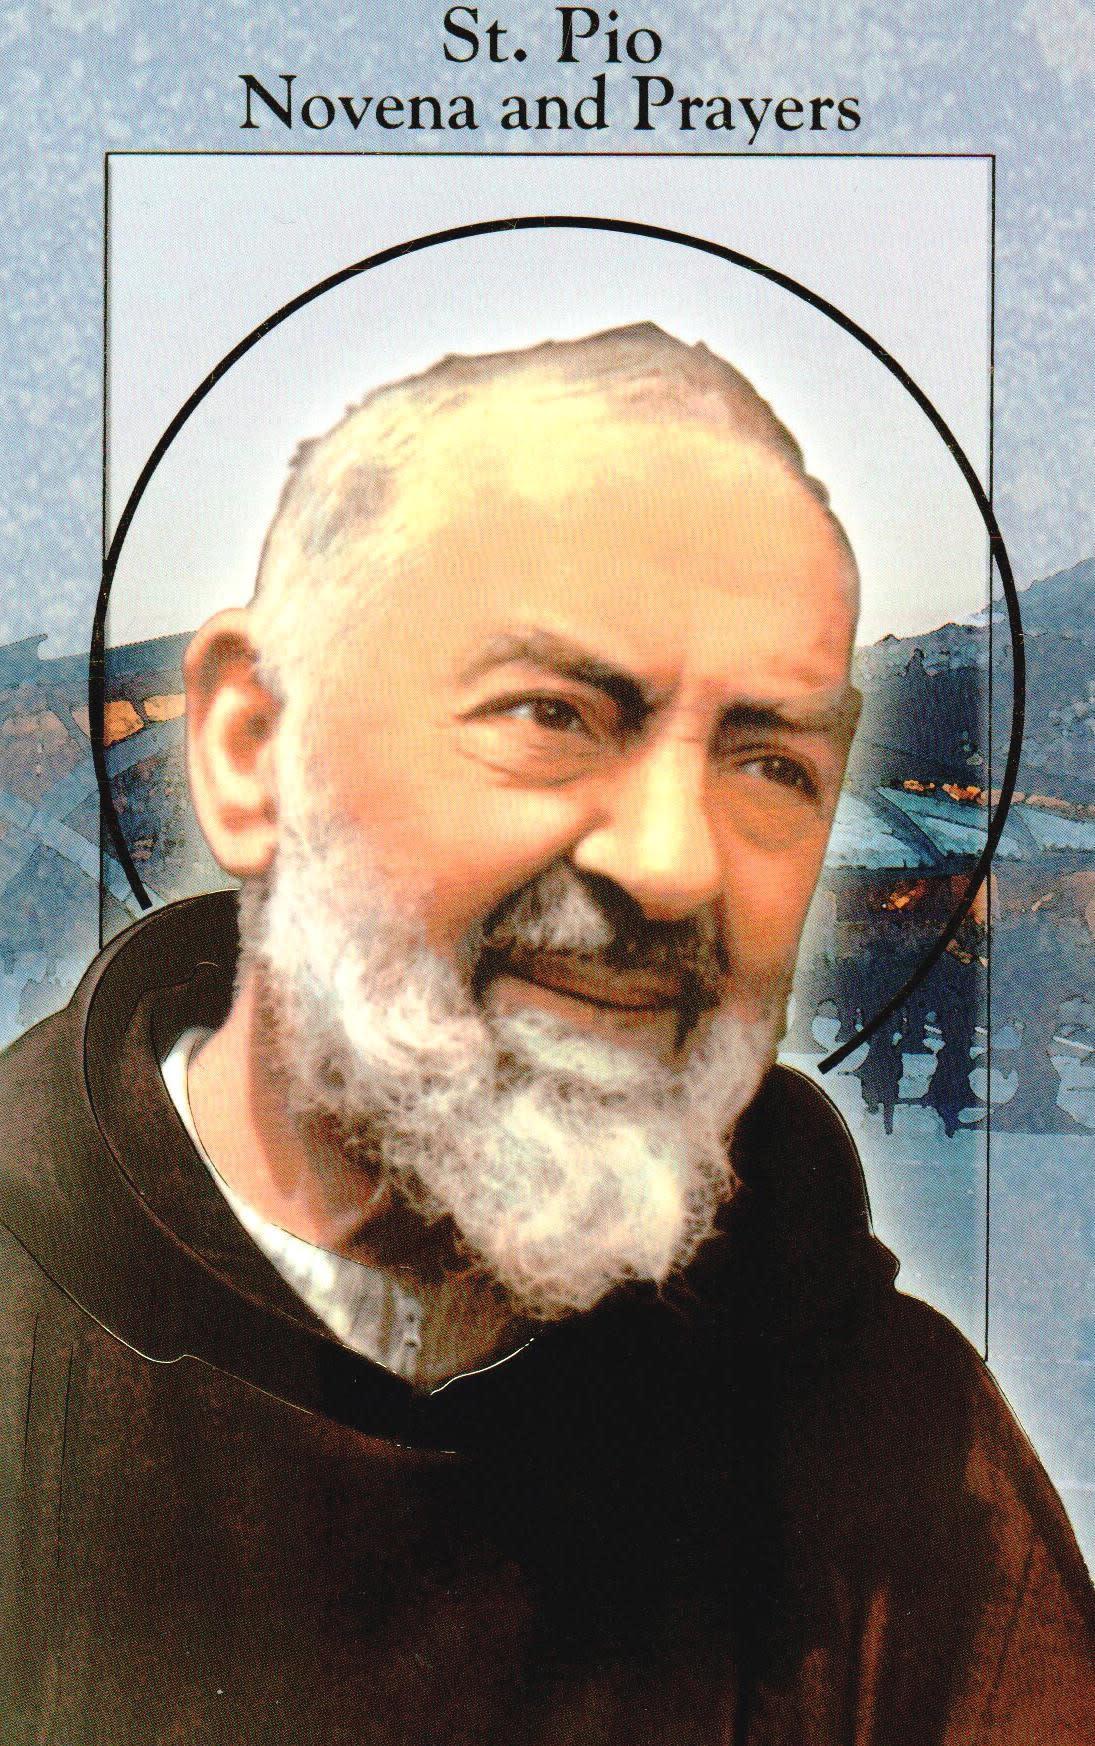 St. Pio of Pietrelcina Novena and Prayers